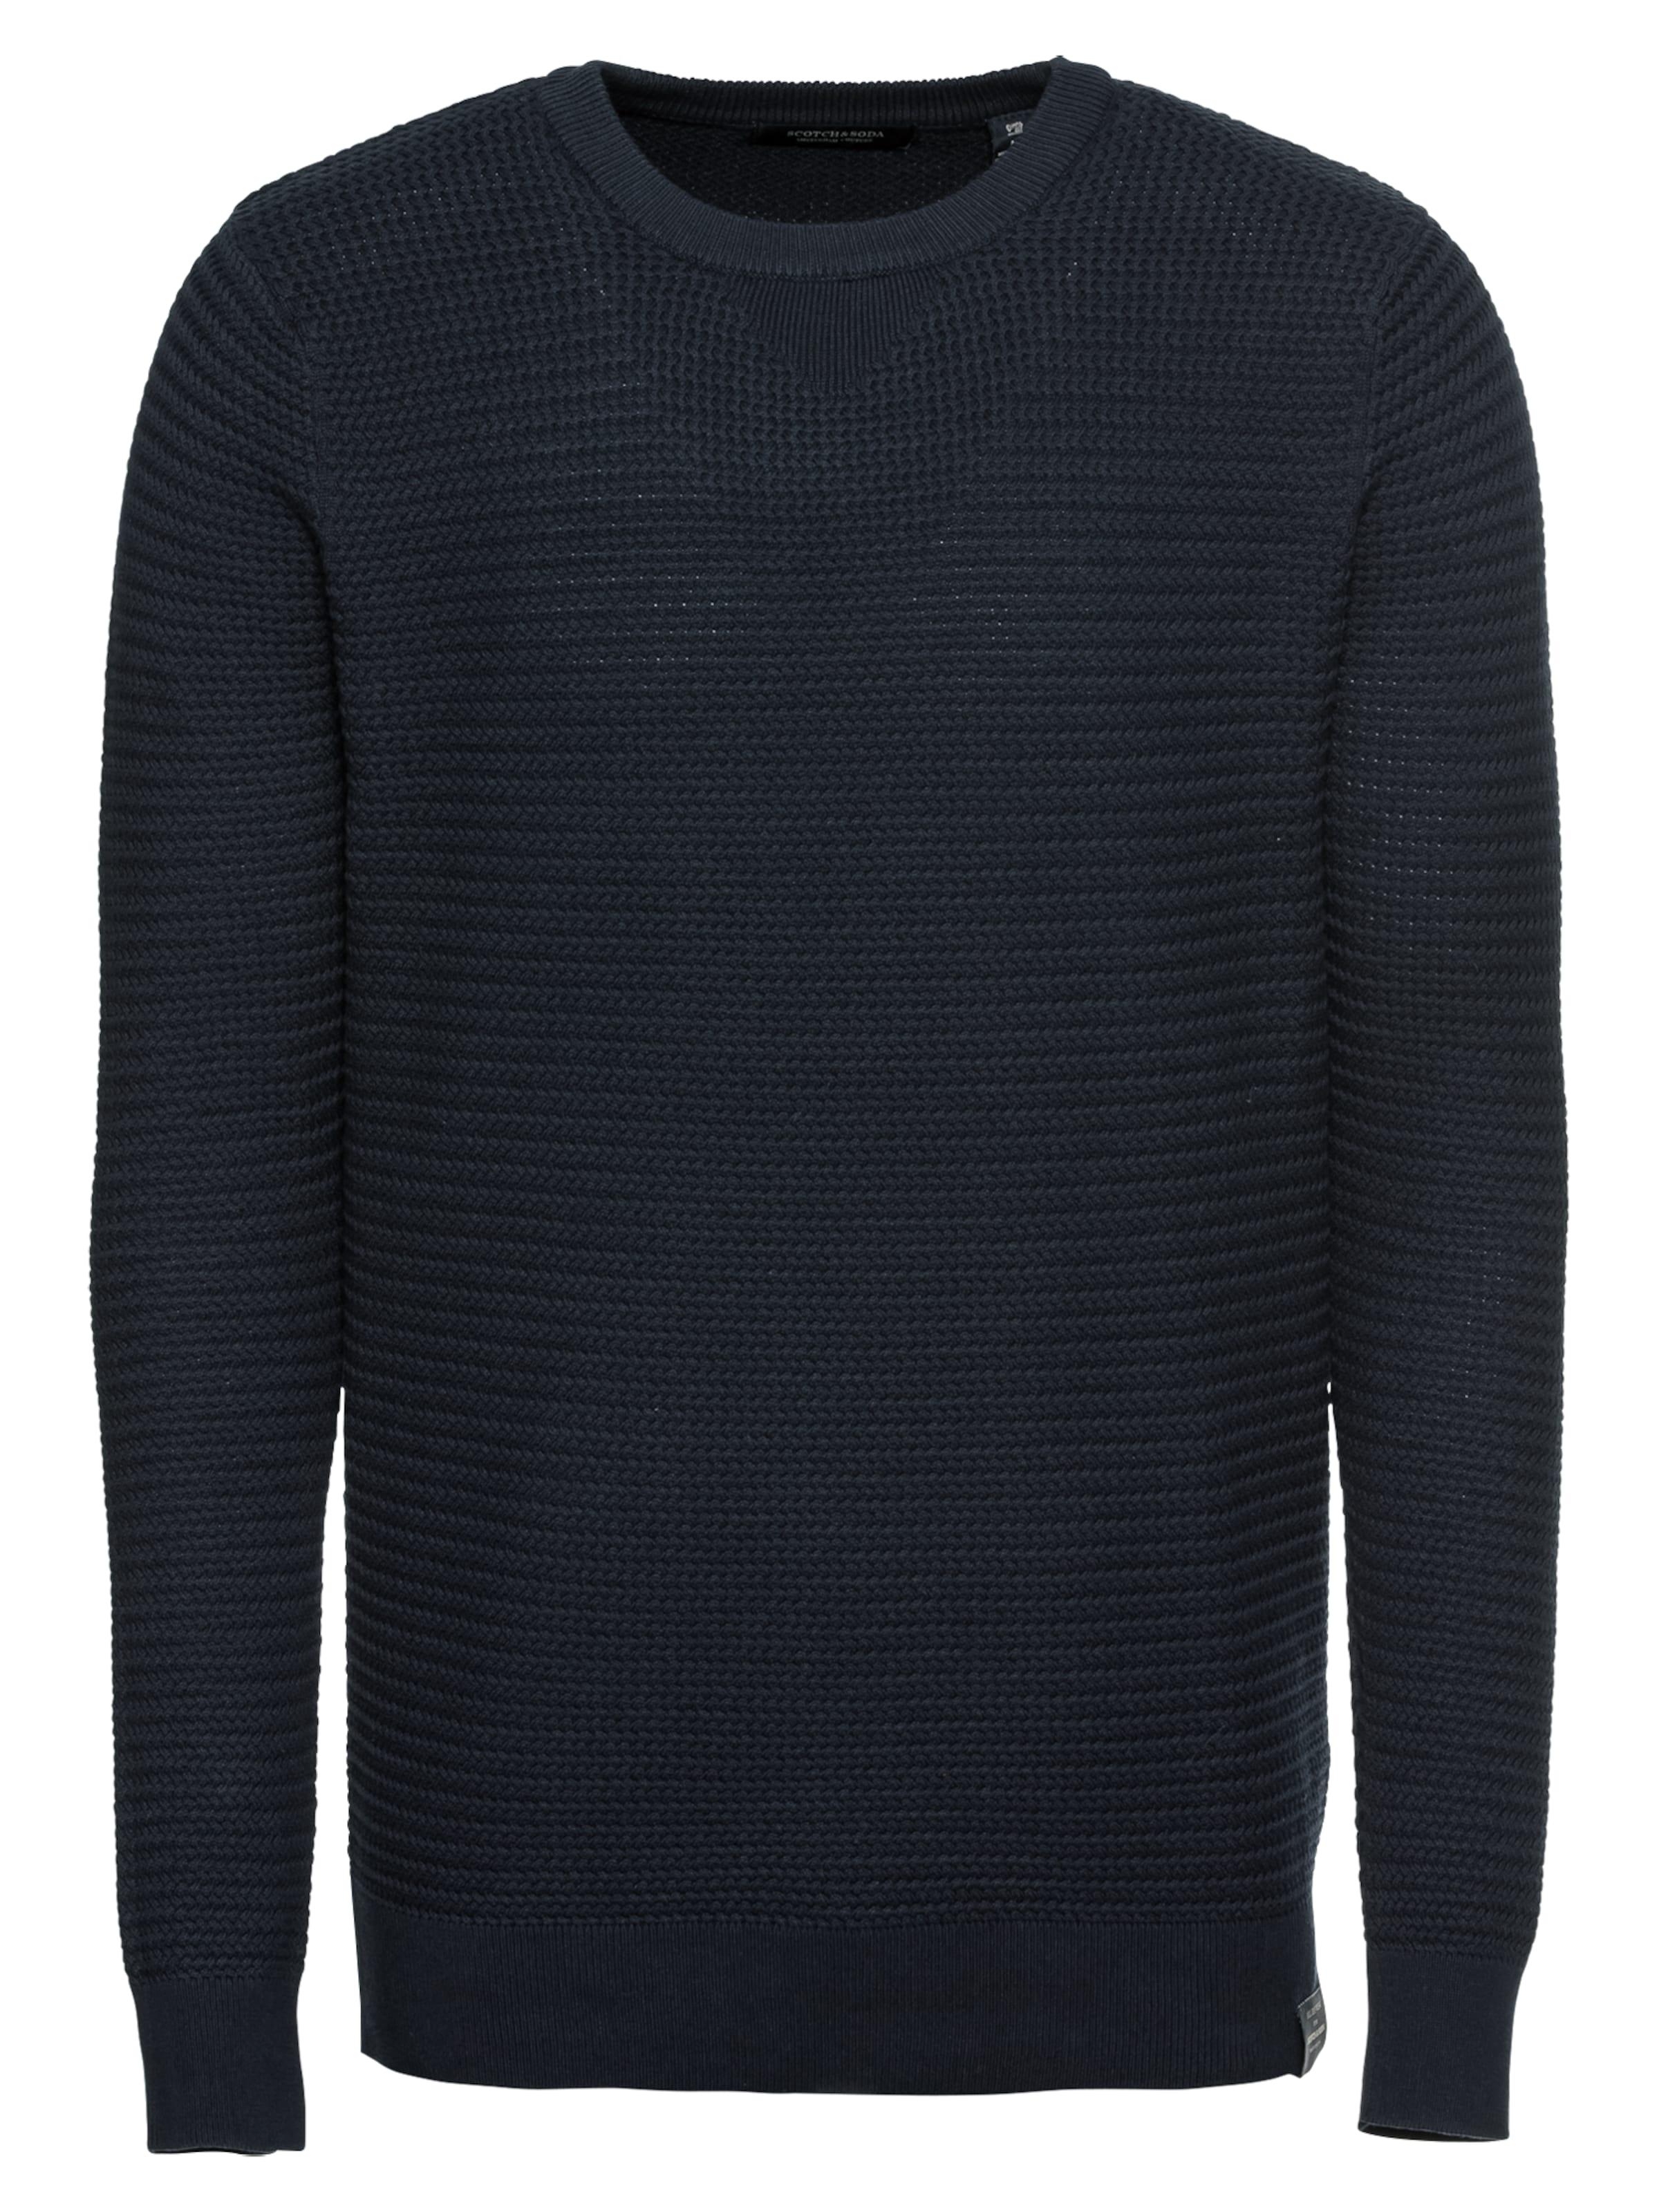 In Crewneck Structured Knit' Nachtblau 'chic Pullover Soda Scotchamp; DIW92EH